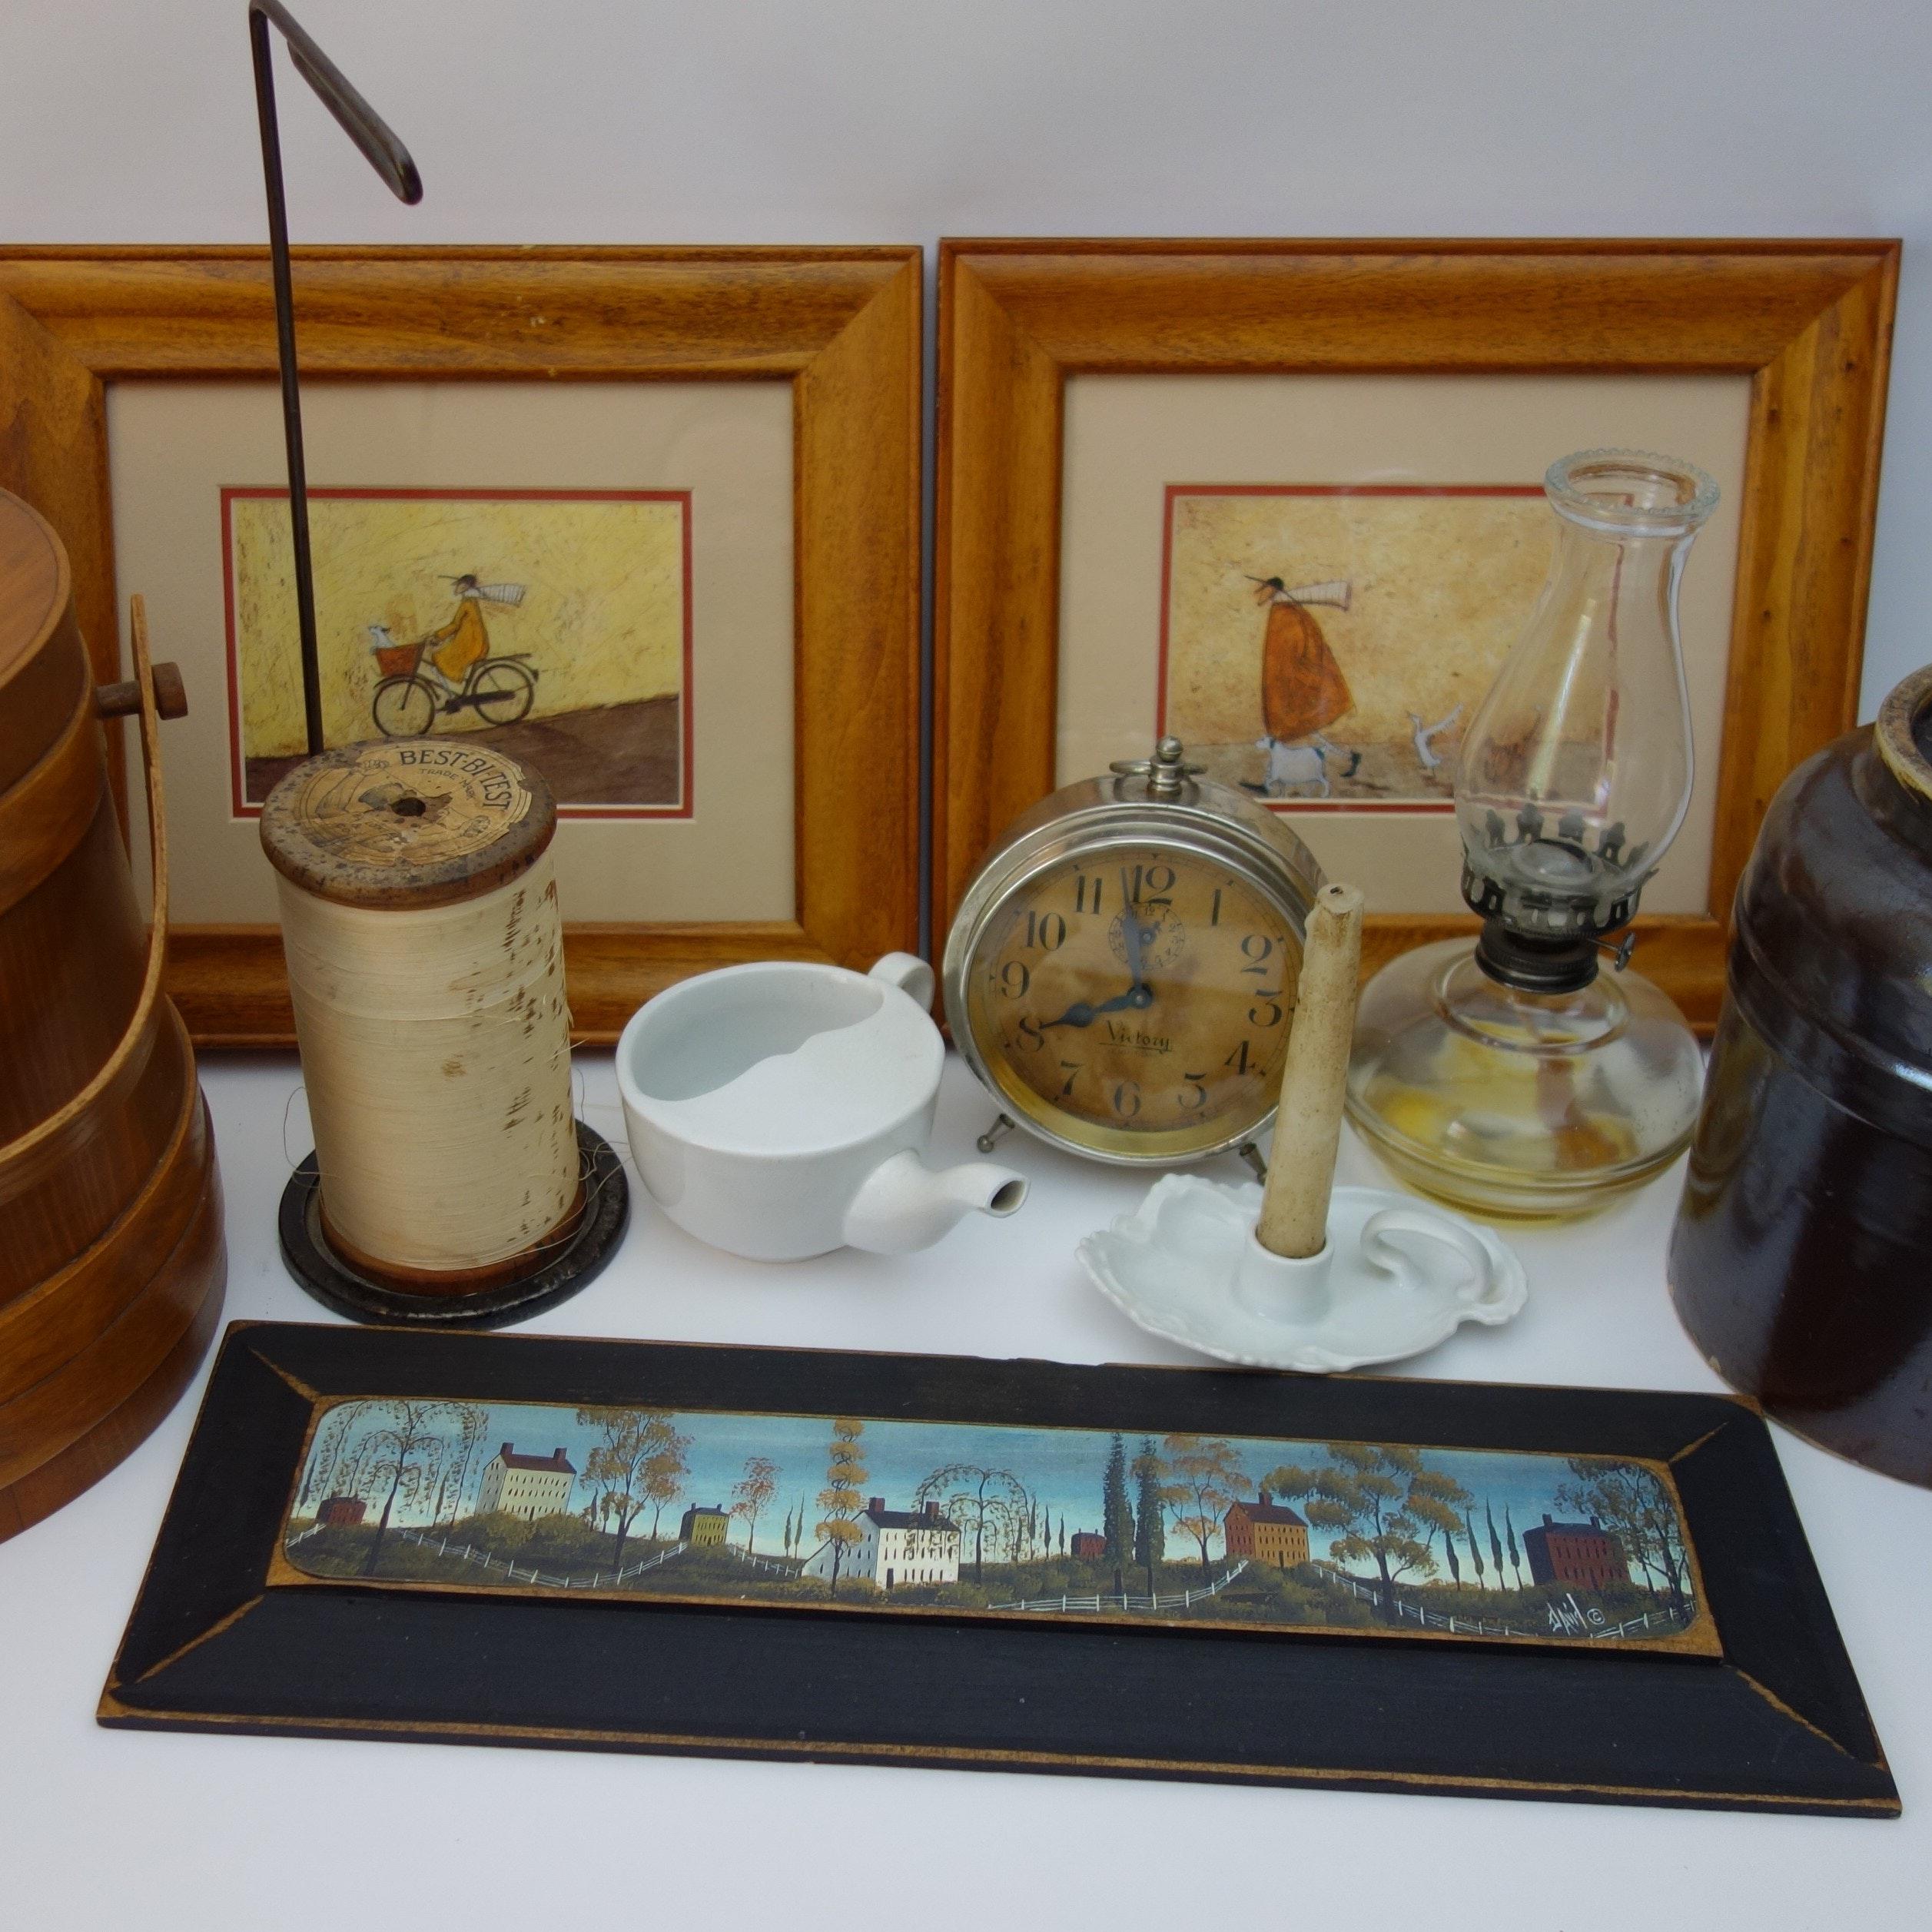 Early Firkin Sugar Bucket, Folk Art, Crock and More